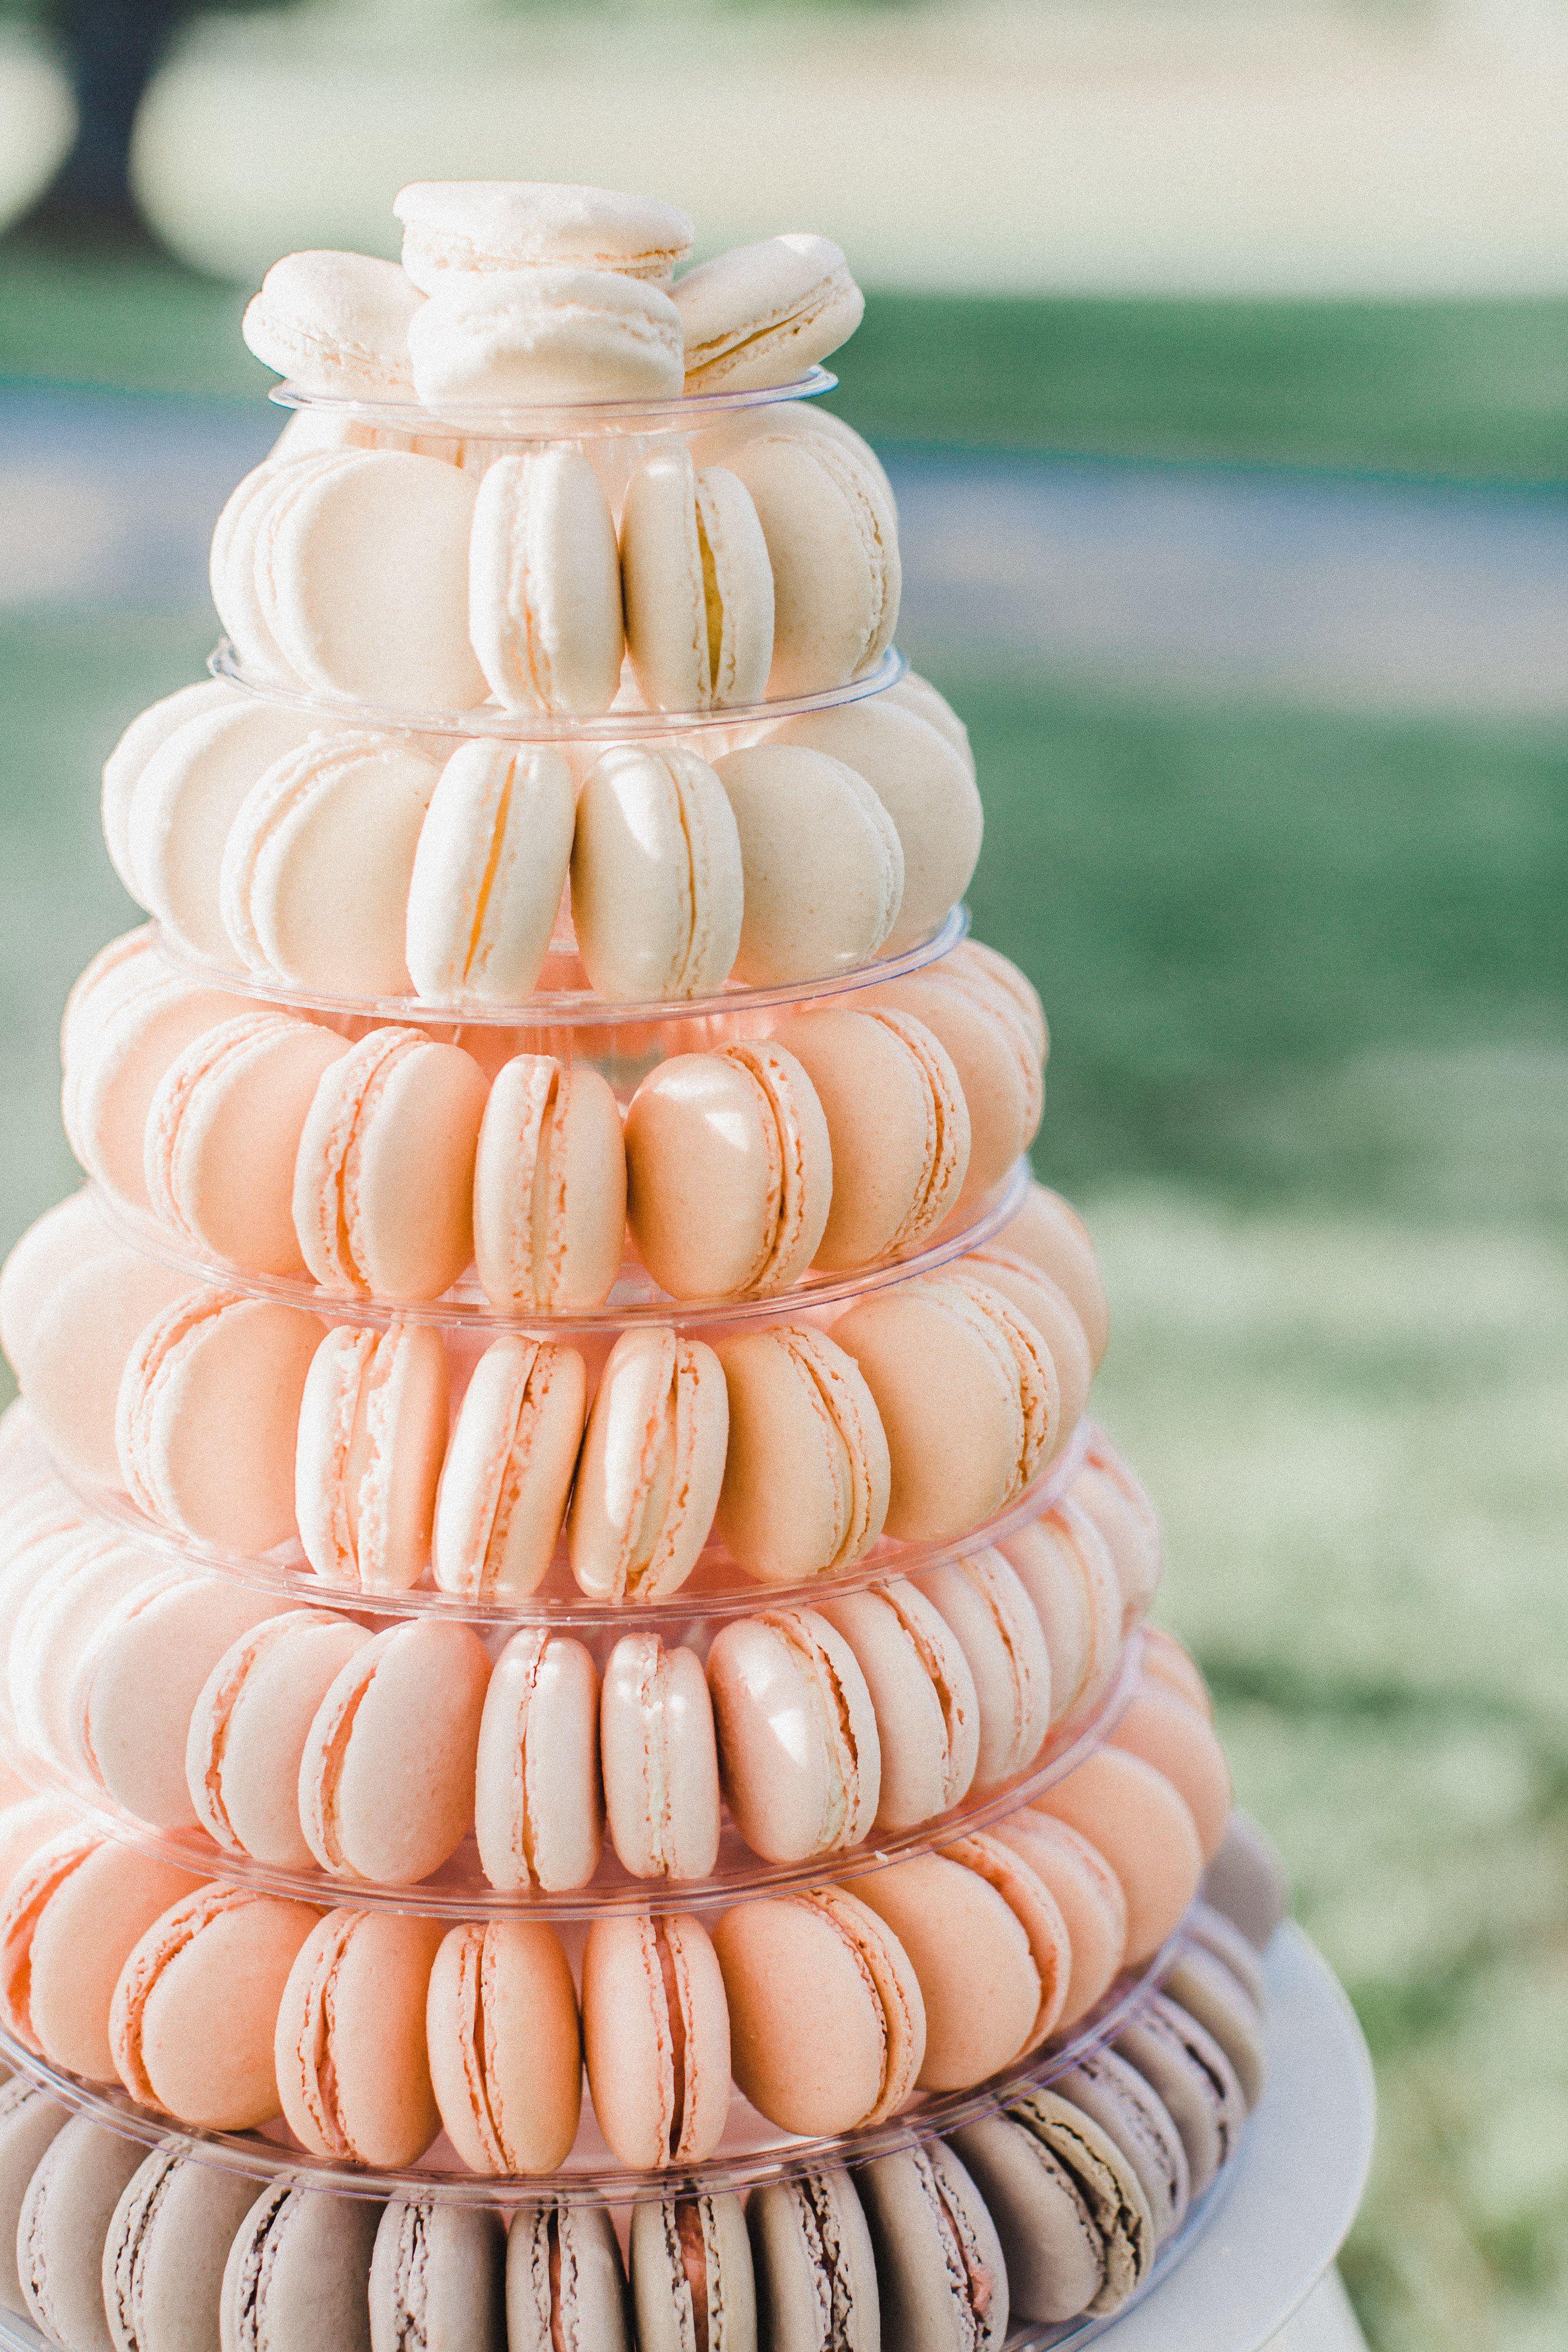 French Macaron Wedding Cake Ombre Macarons Wedding Macarons Wedding Cake Alternatives Macaroons Wedding